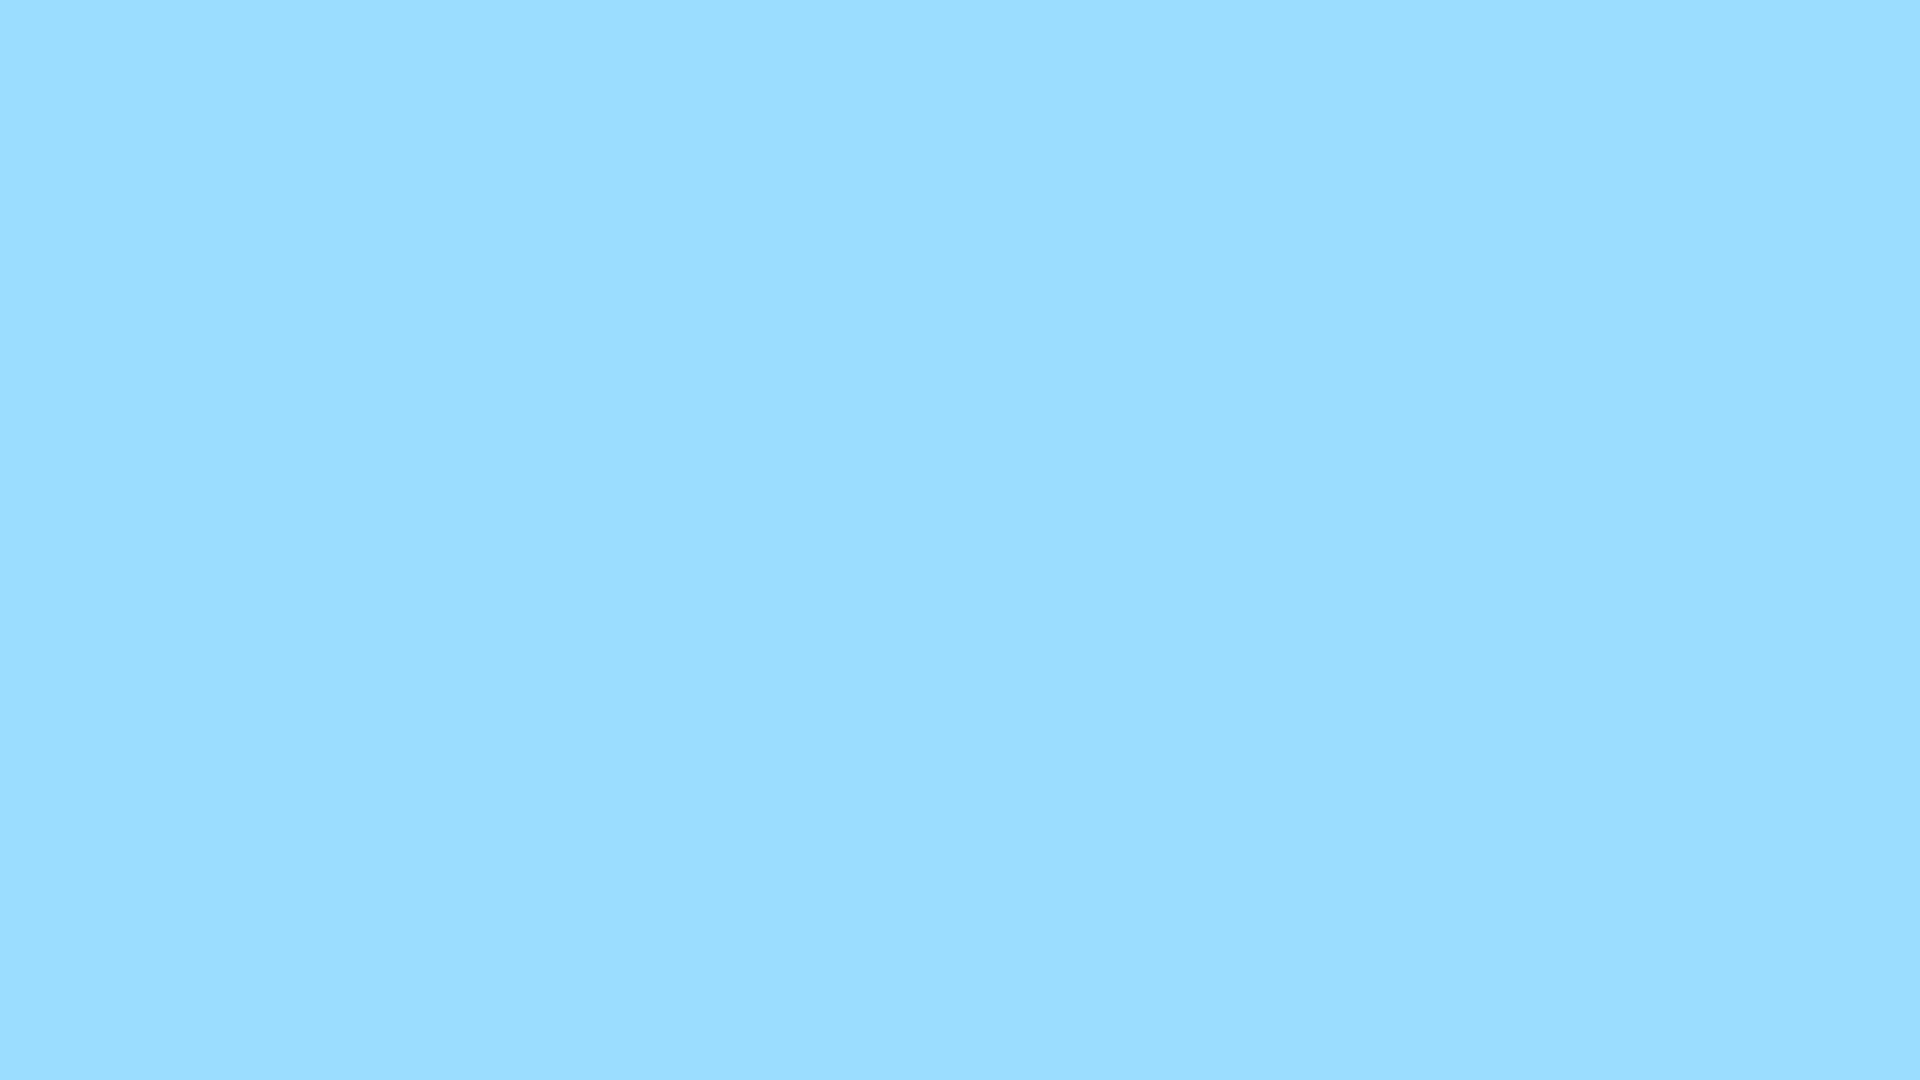 Desktop Wallpaper Cute Doll Columbia Blue Wallpaper High Definition High Quality